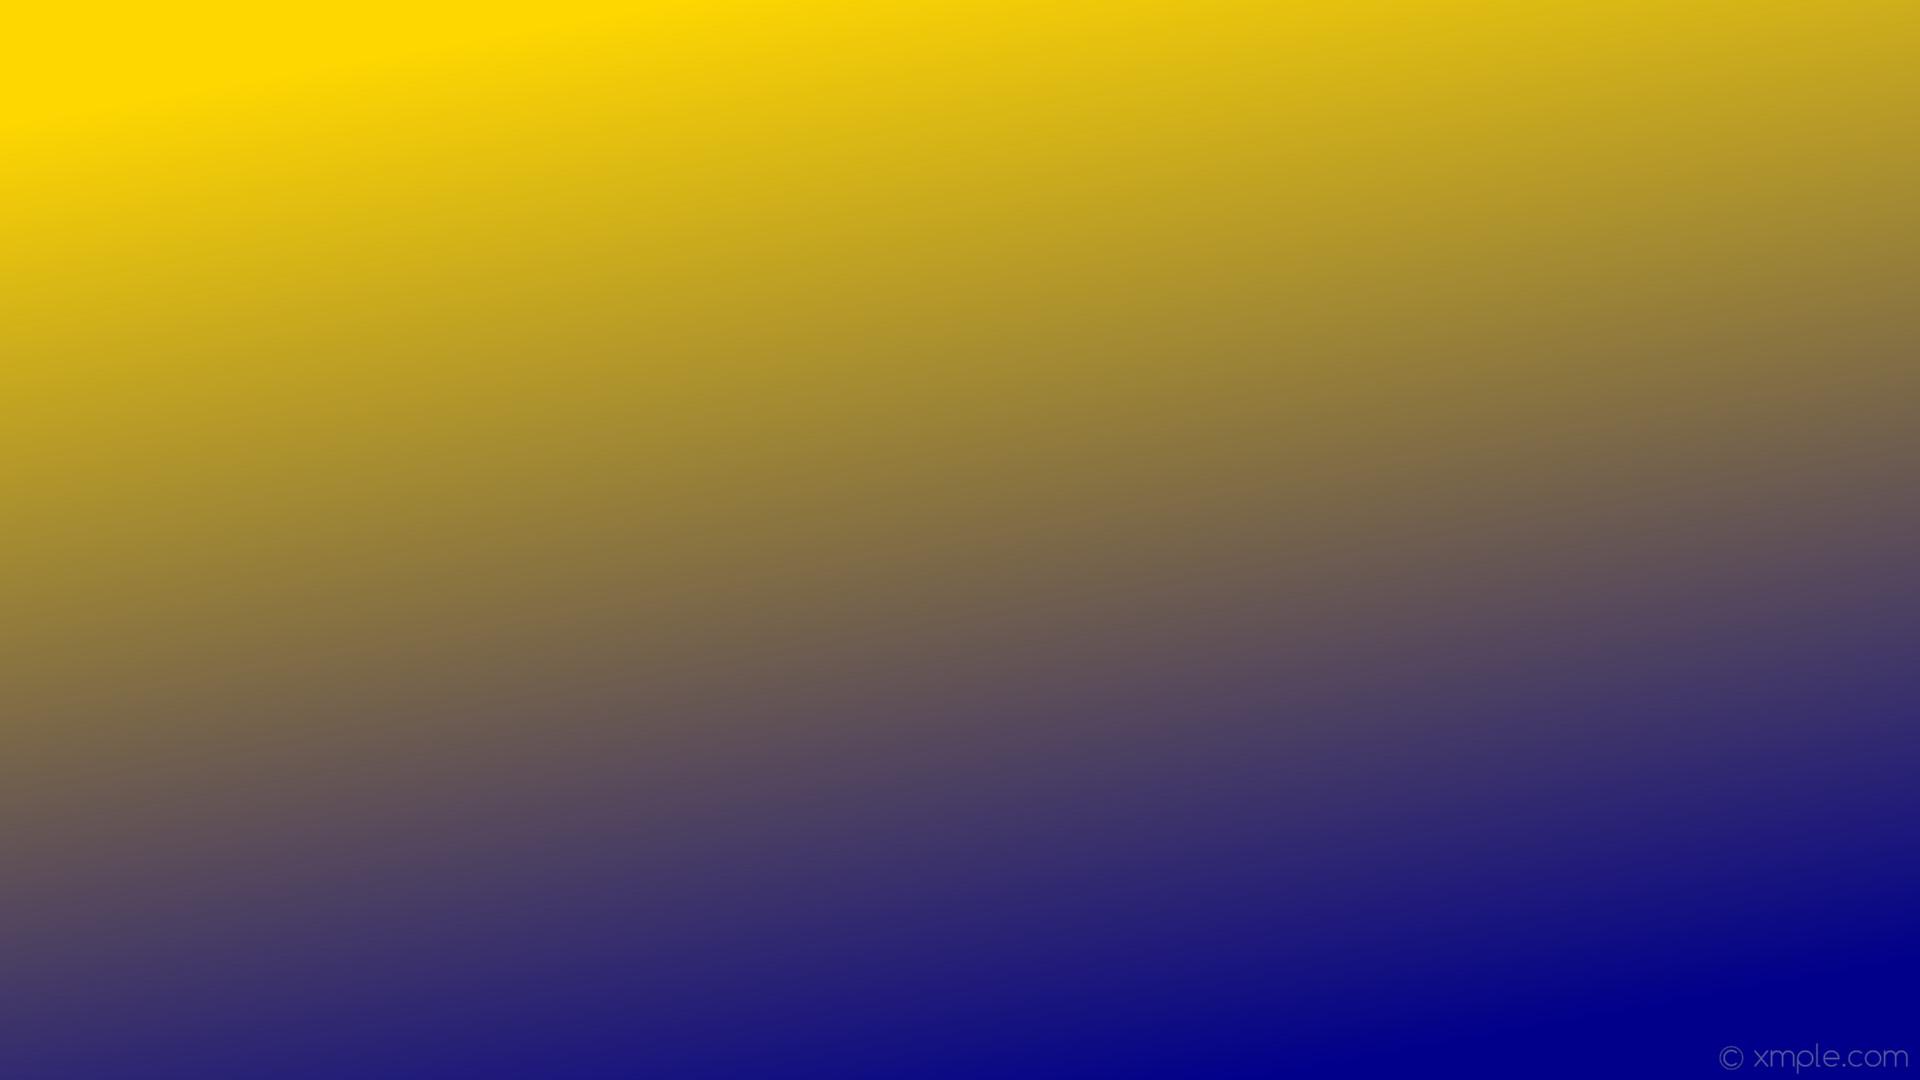 wallpaper blue yellow gradient linear dark blue gold #00008b #ffd700 300°